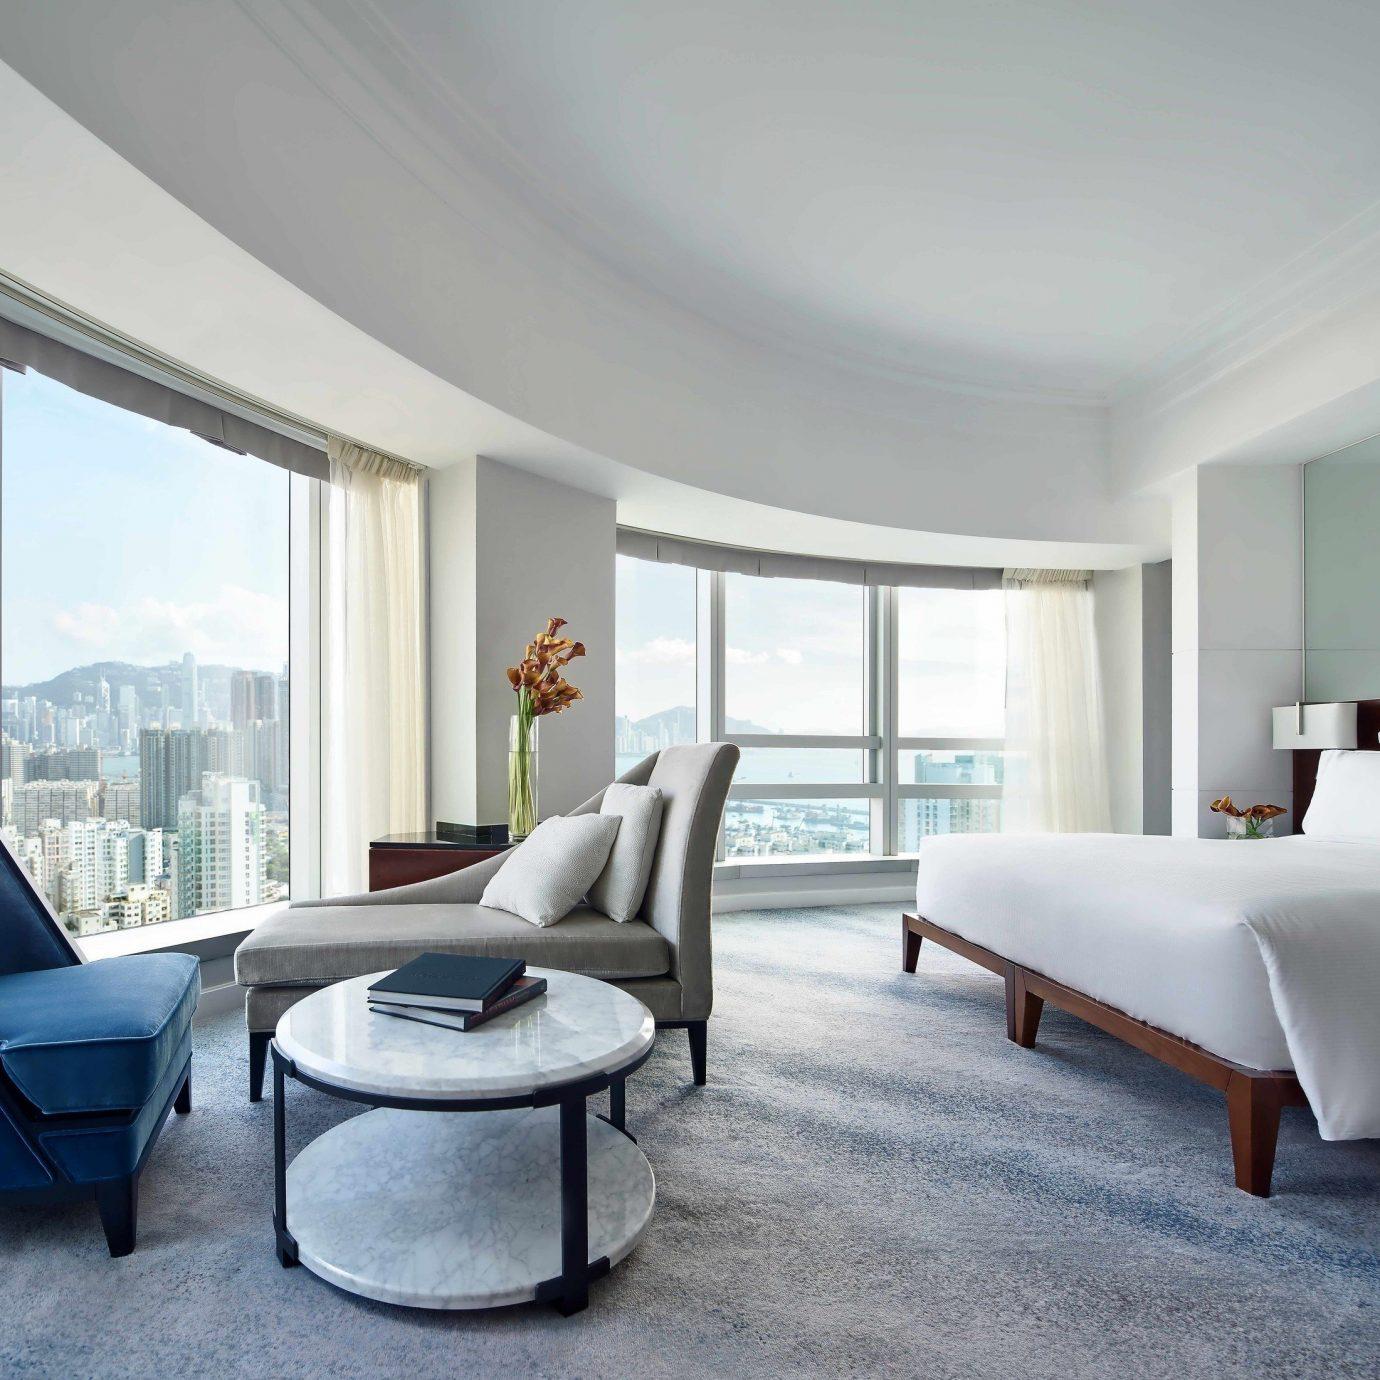 sofa property living room condominium Suite home Bedroom